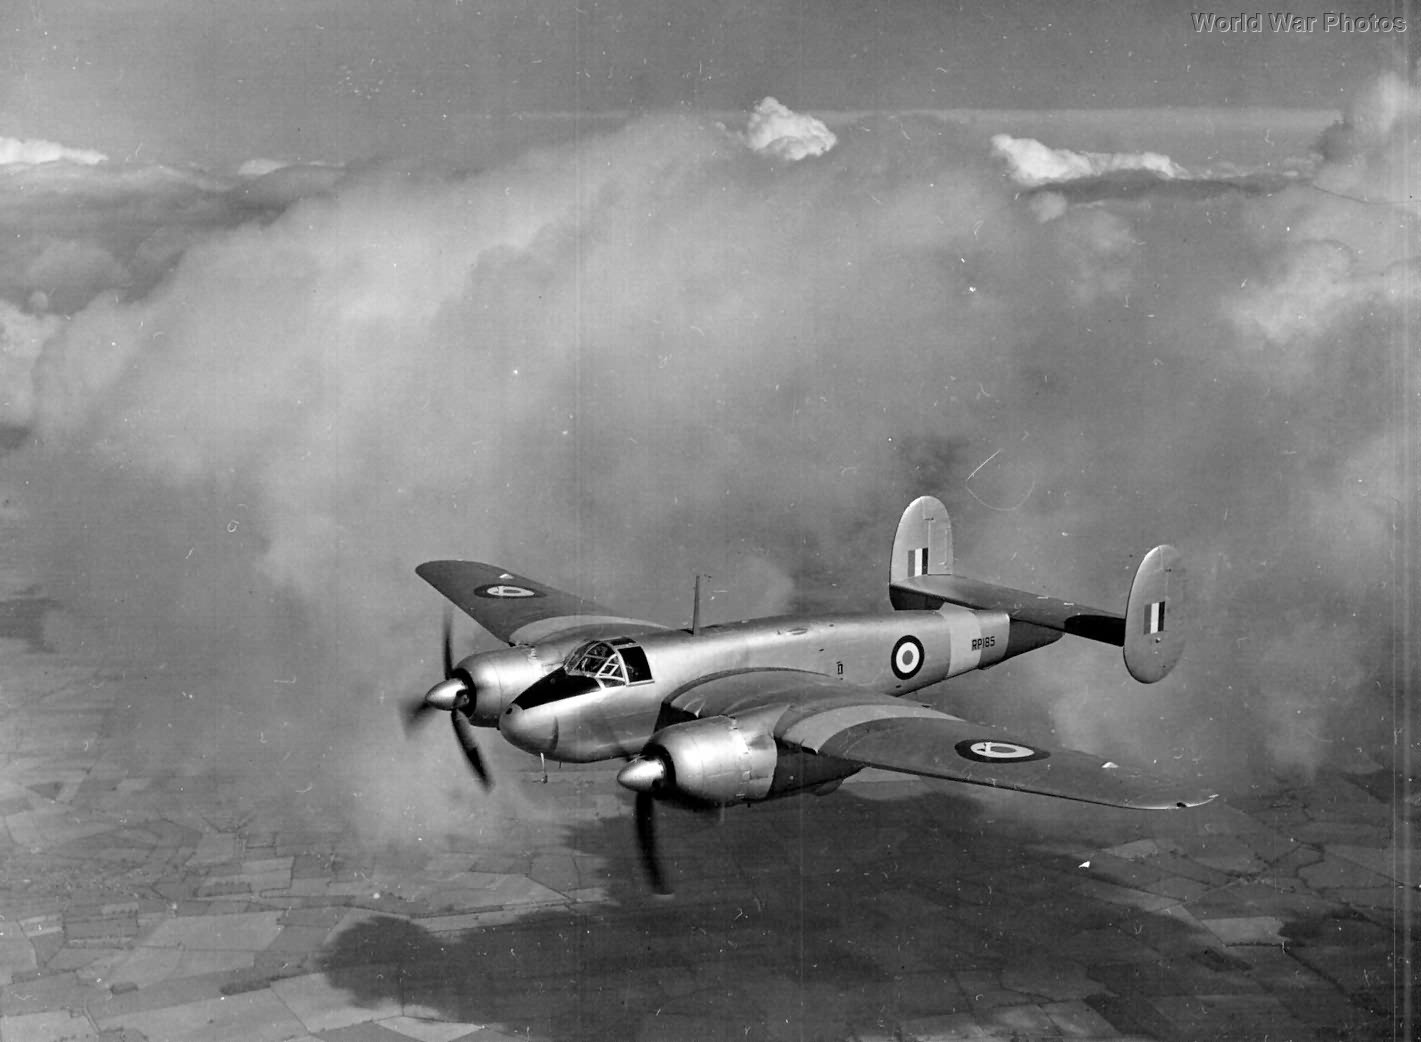 Buckmaster RP185 in flight